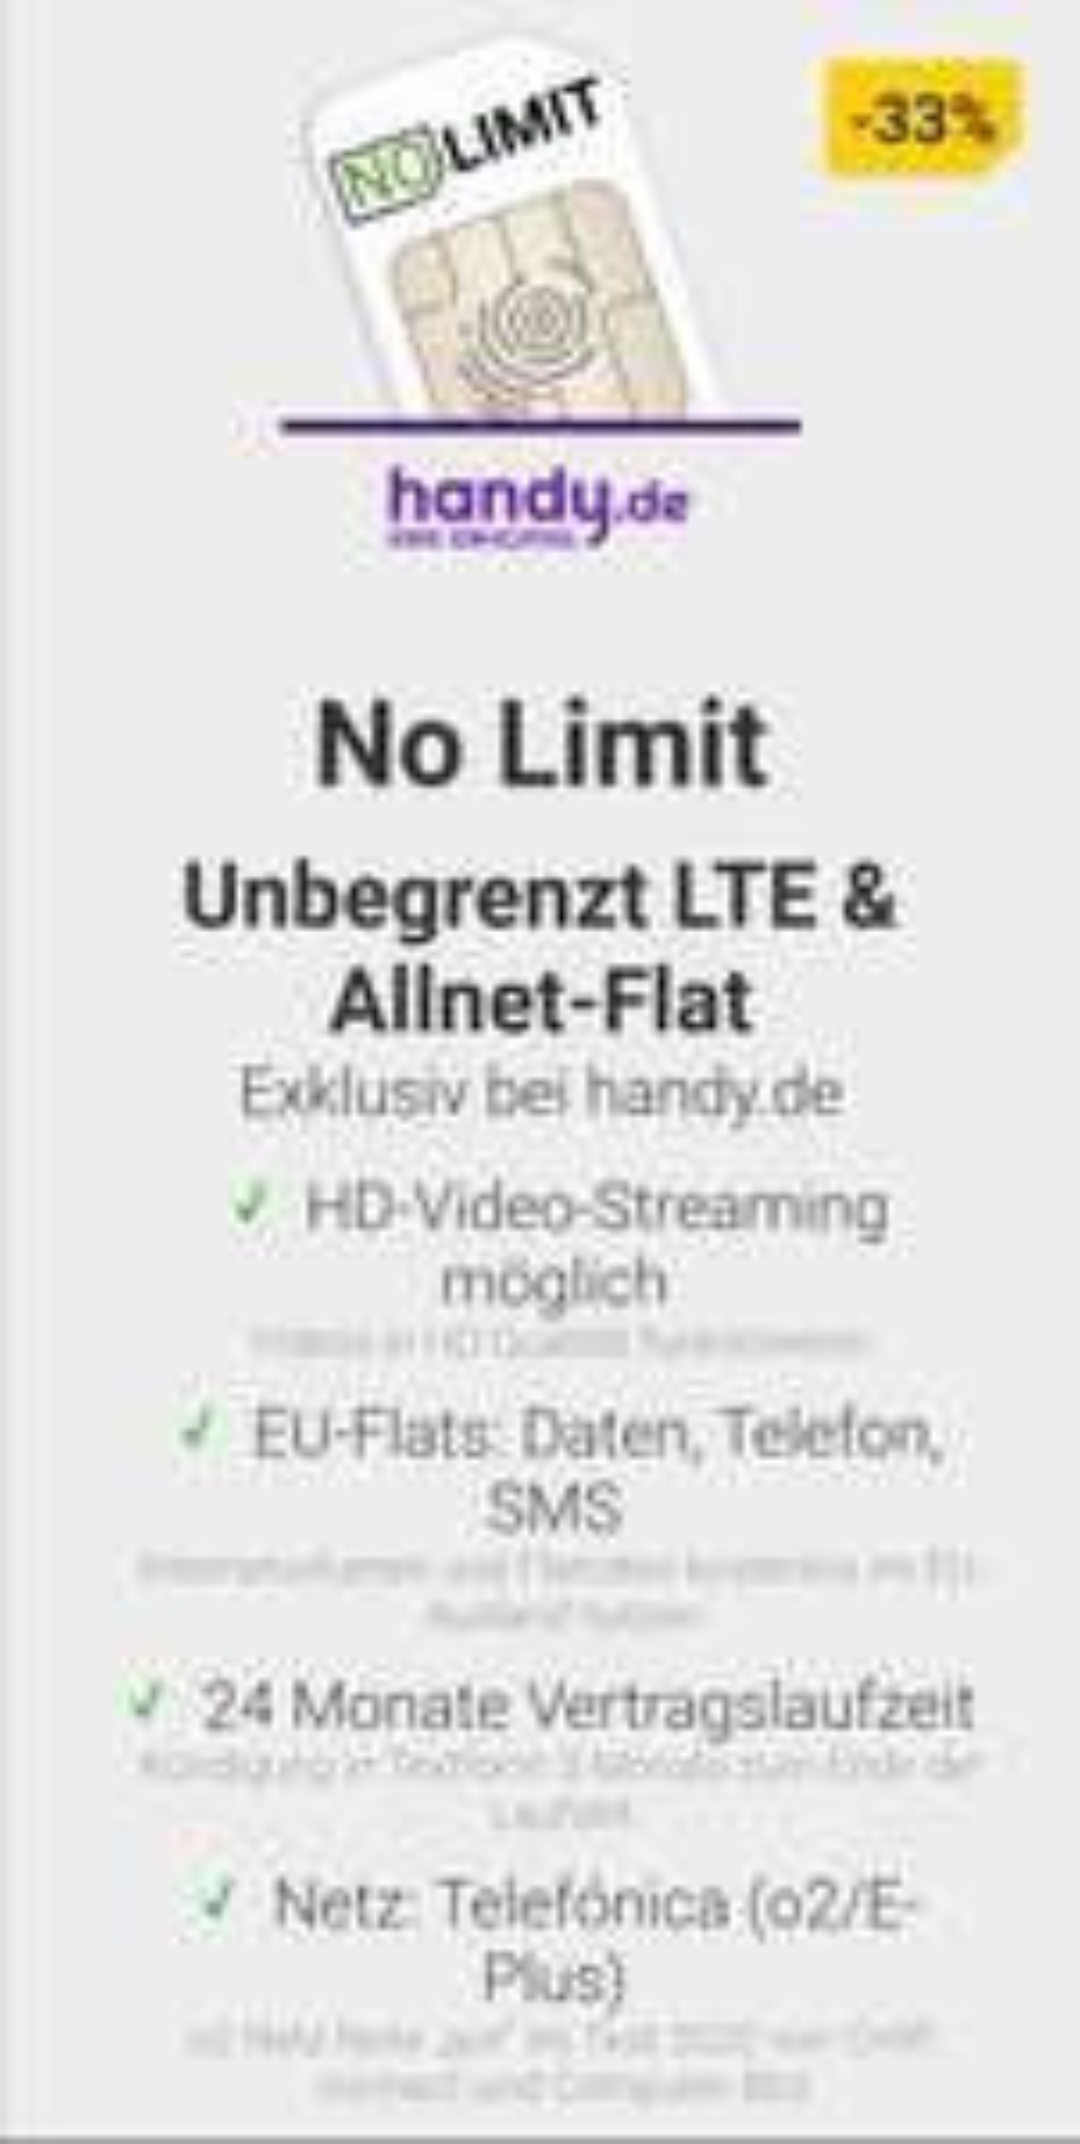 mobilcom debitel Telefonica Unlimited Basic Unbegrenzt LTE bis zu 2 Mbit/s, Allnet Flat 19,99 €, 24 Monate [handy.de]